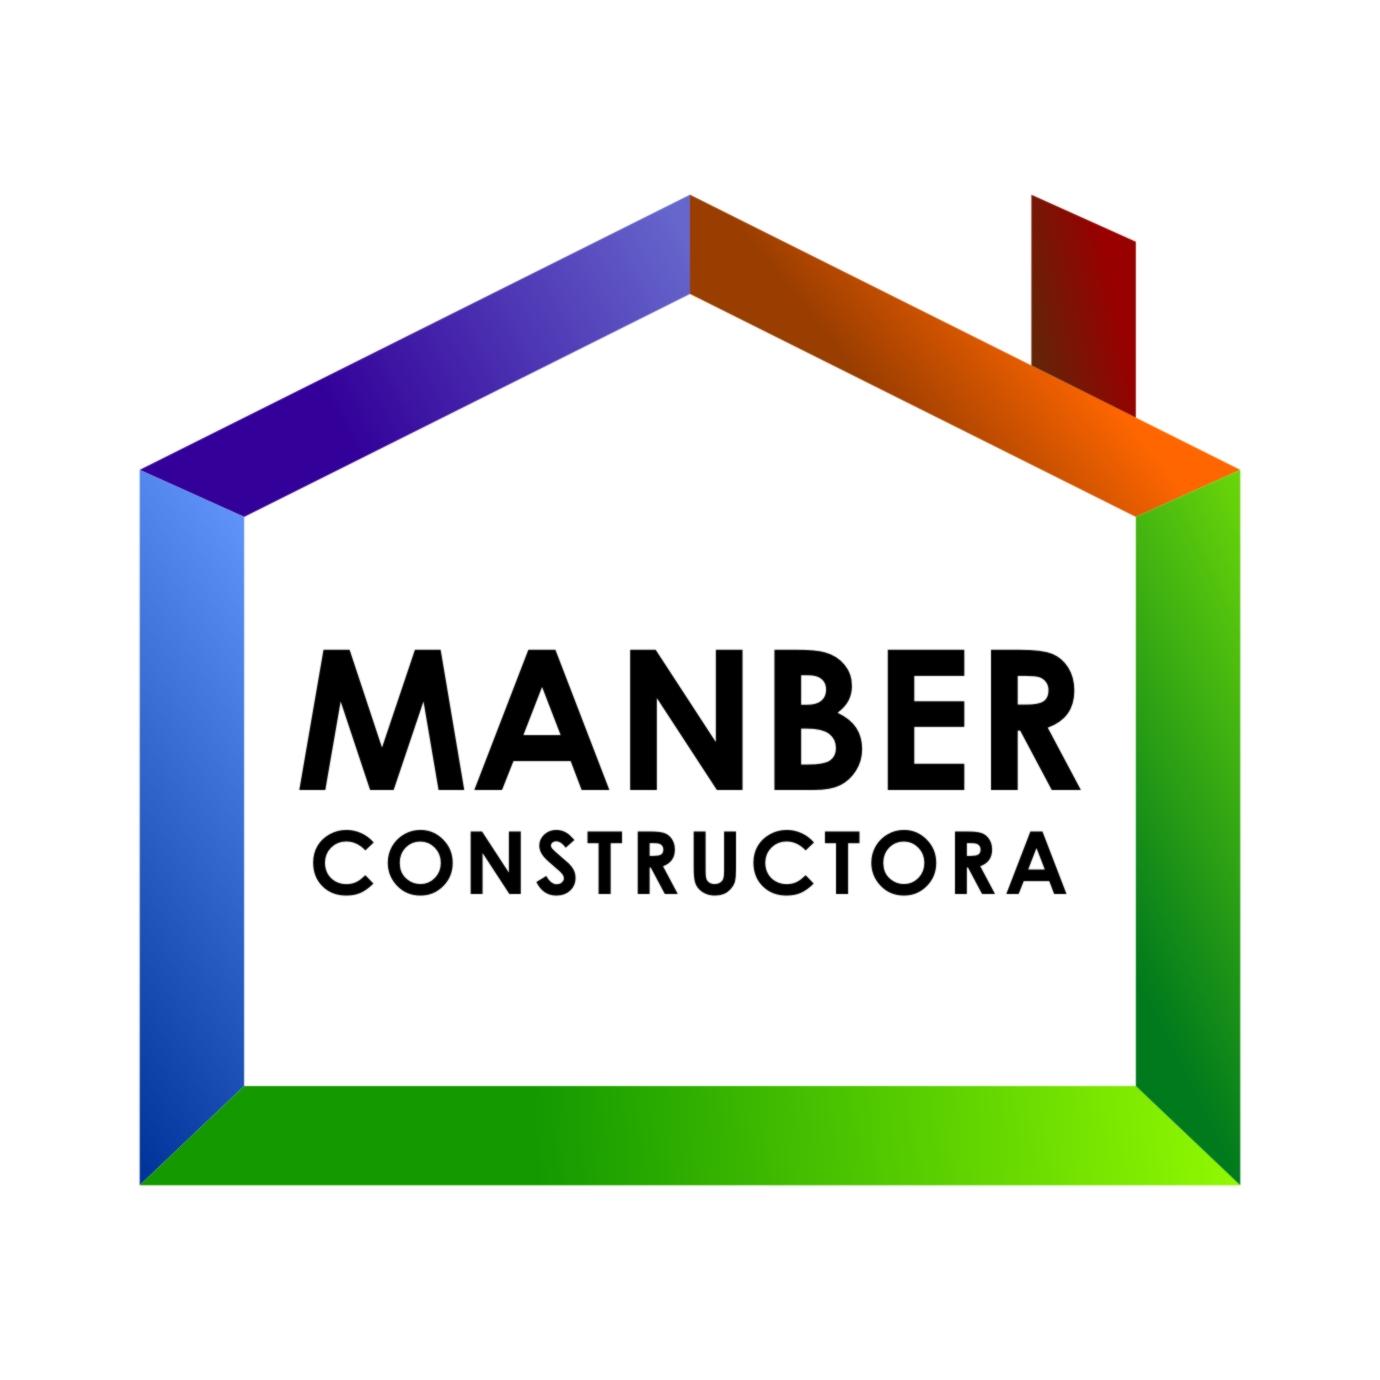 Manber Constructora